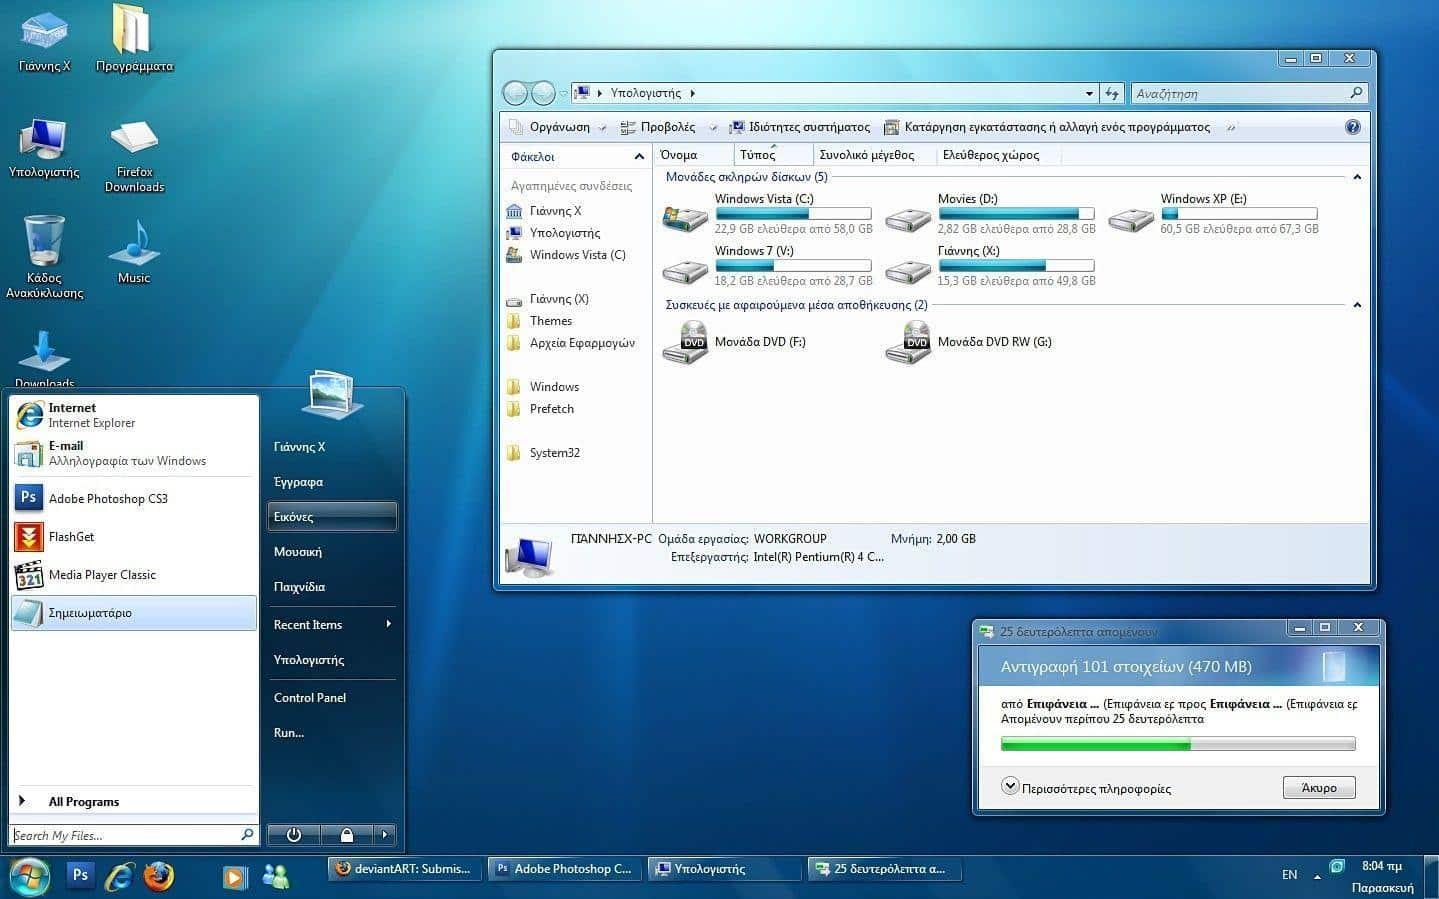 Microsoft eliminar soporte t cnico de windows 7 en 2015 for Window 07 themes